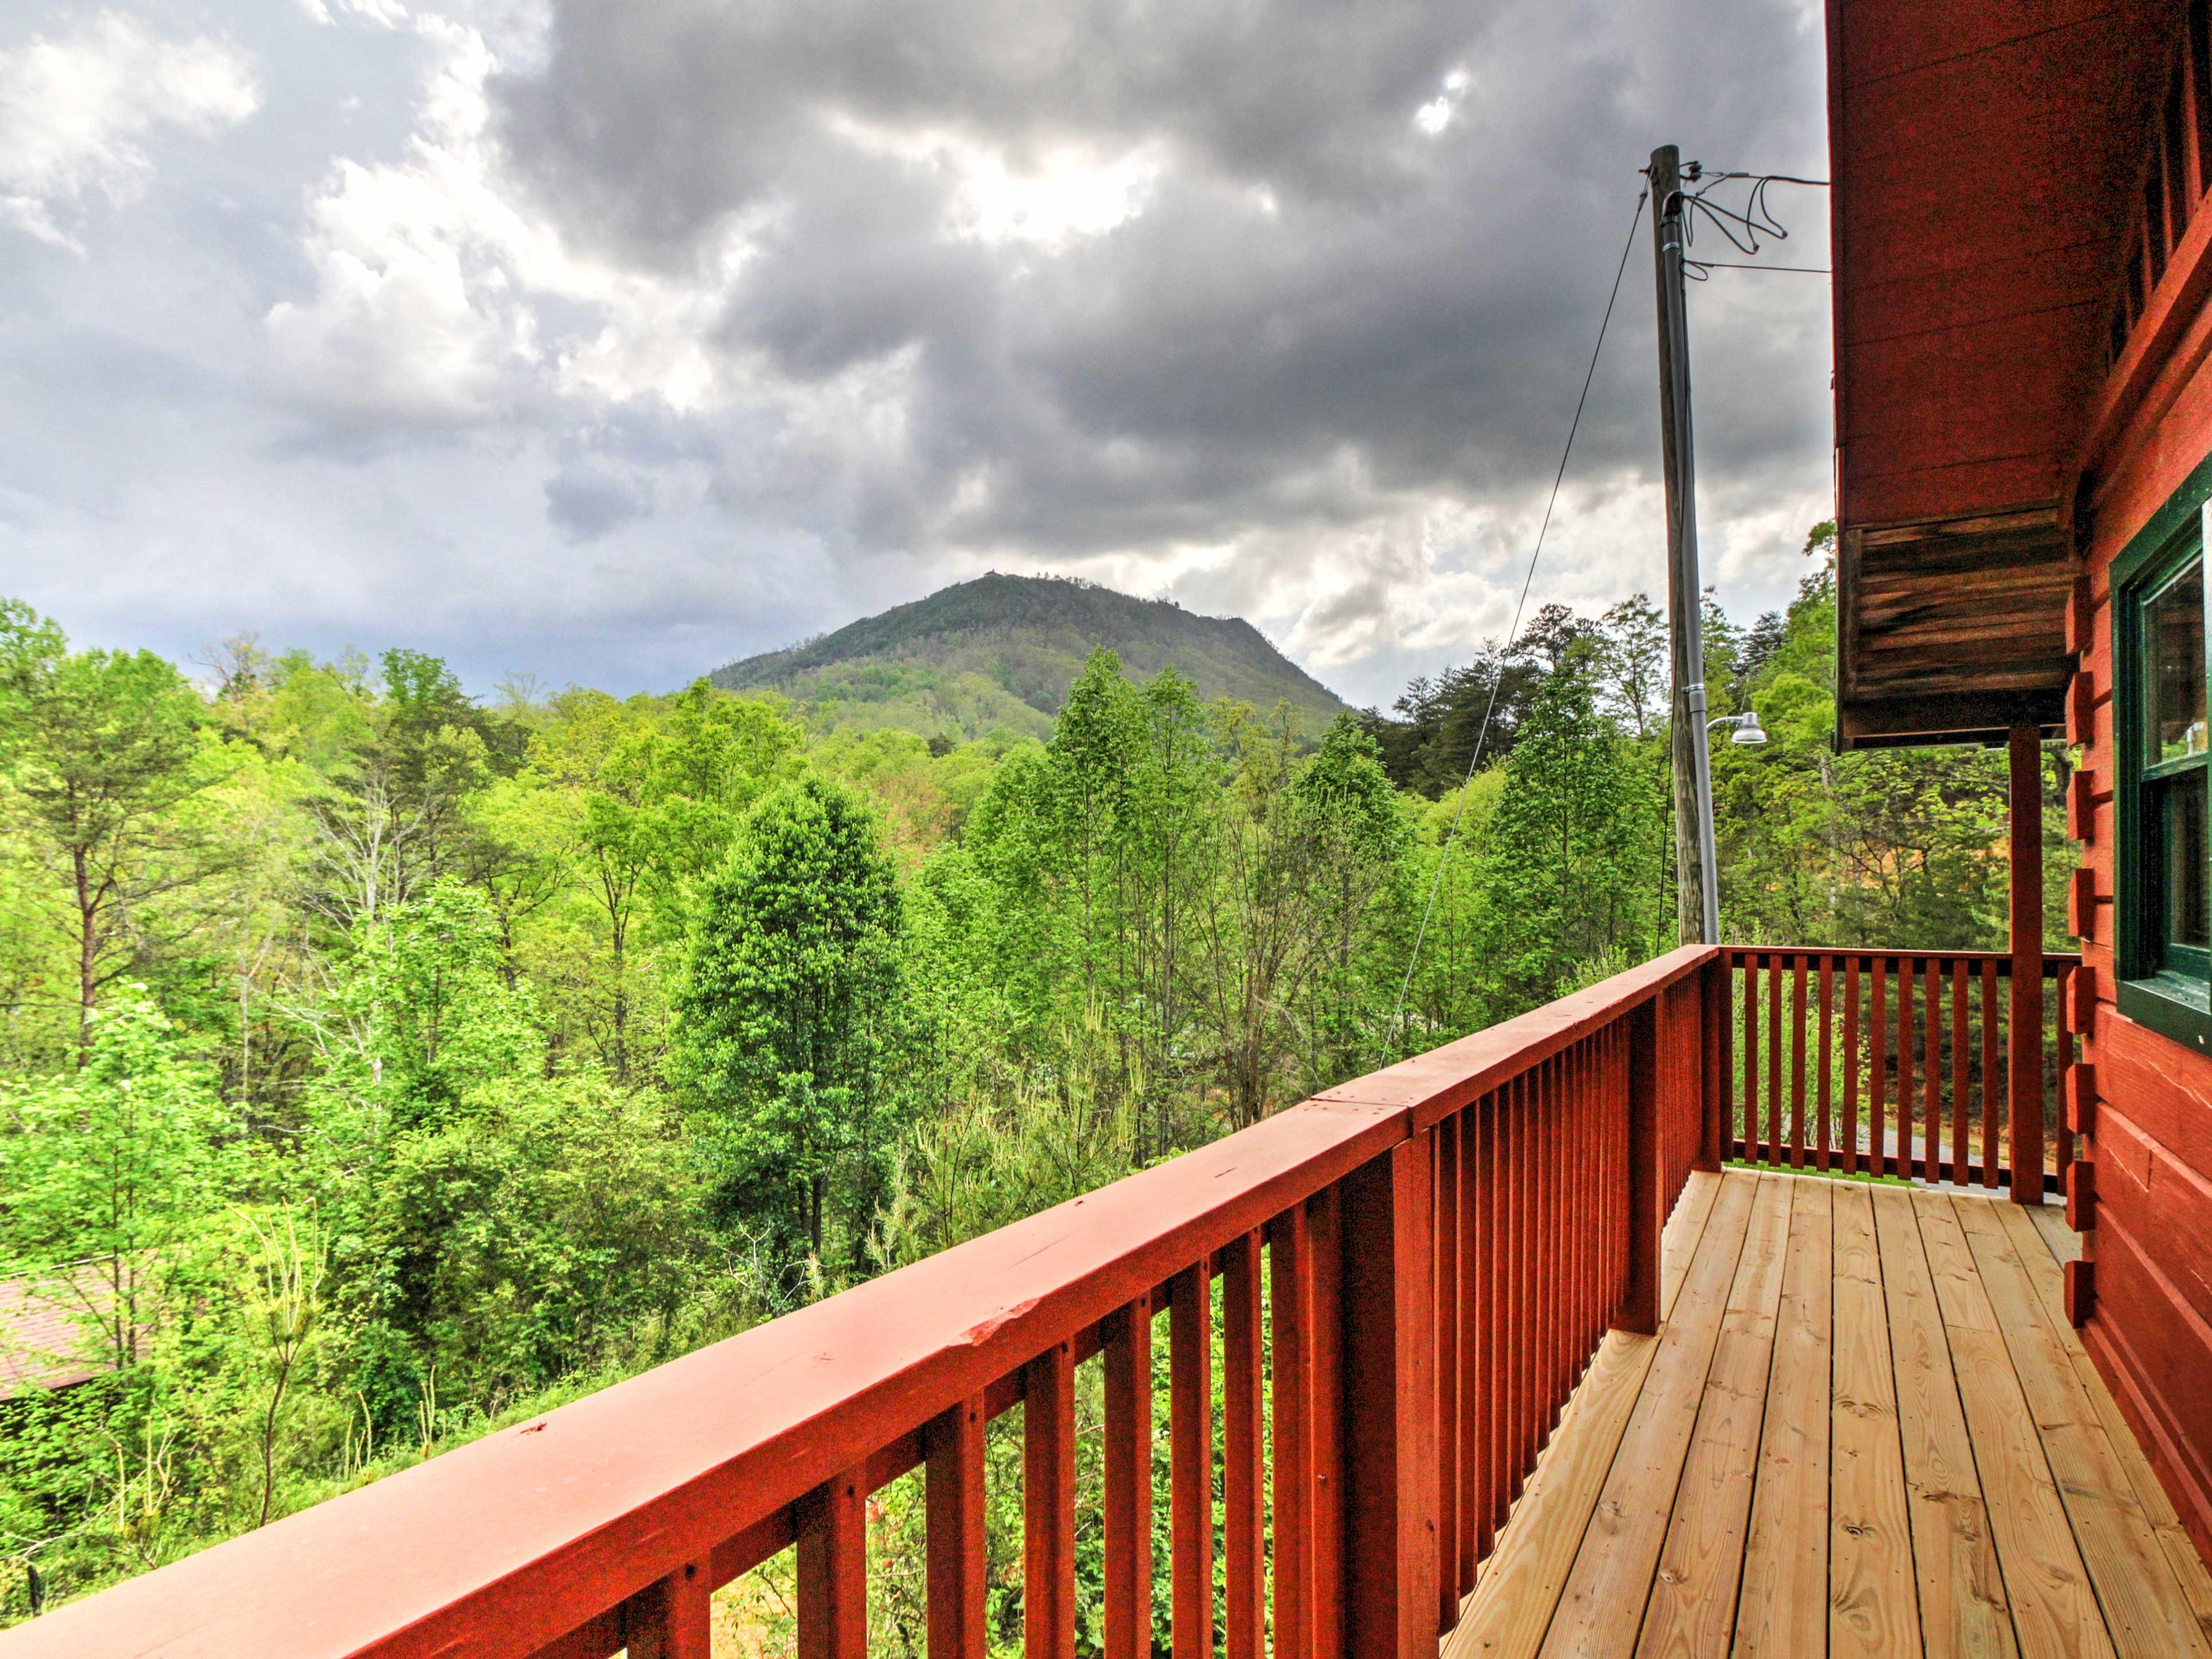 Endless outdoor recreation awaits just minutes away.